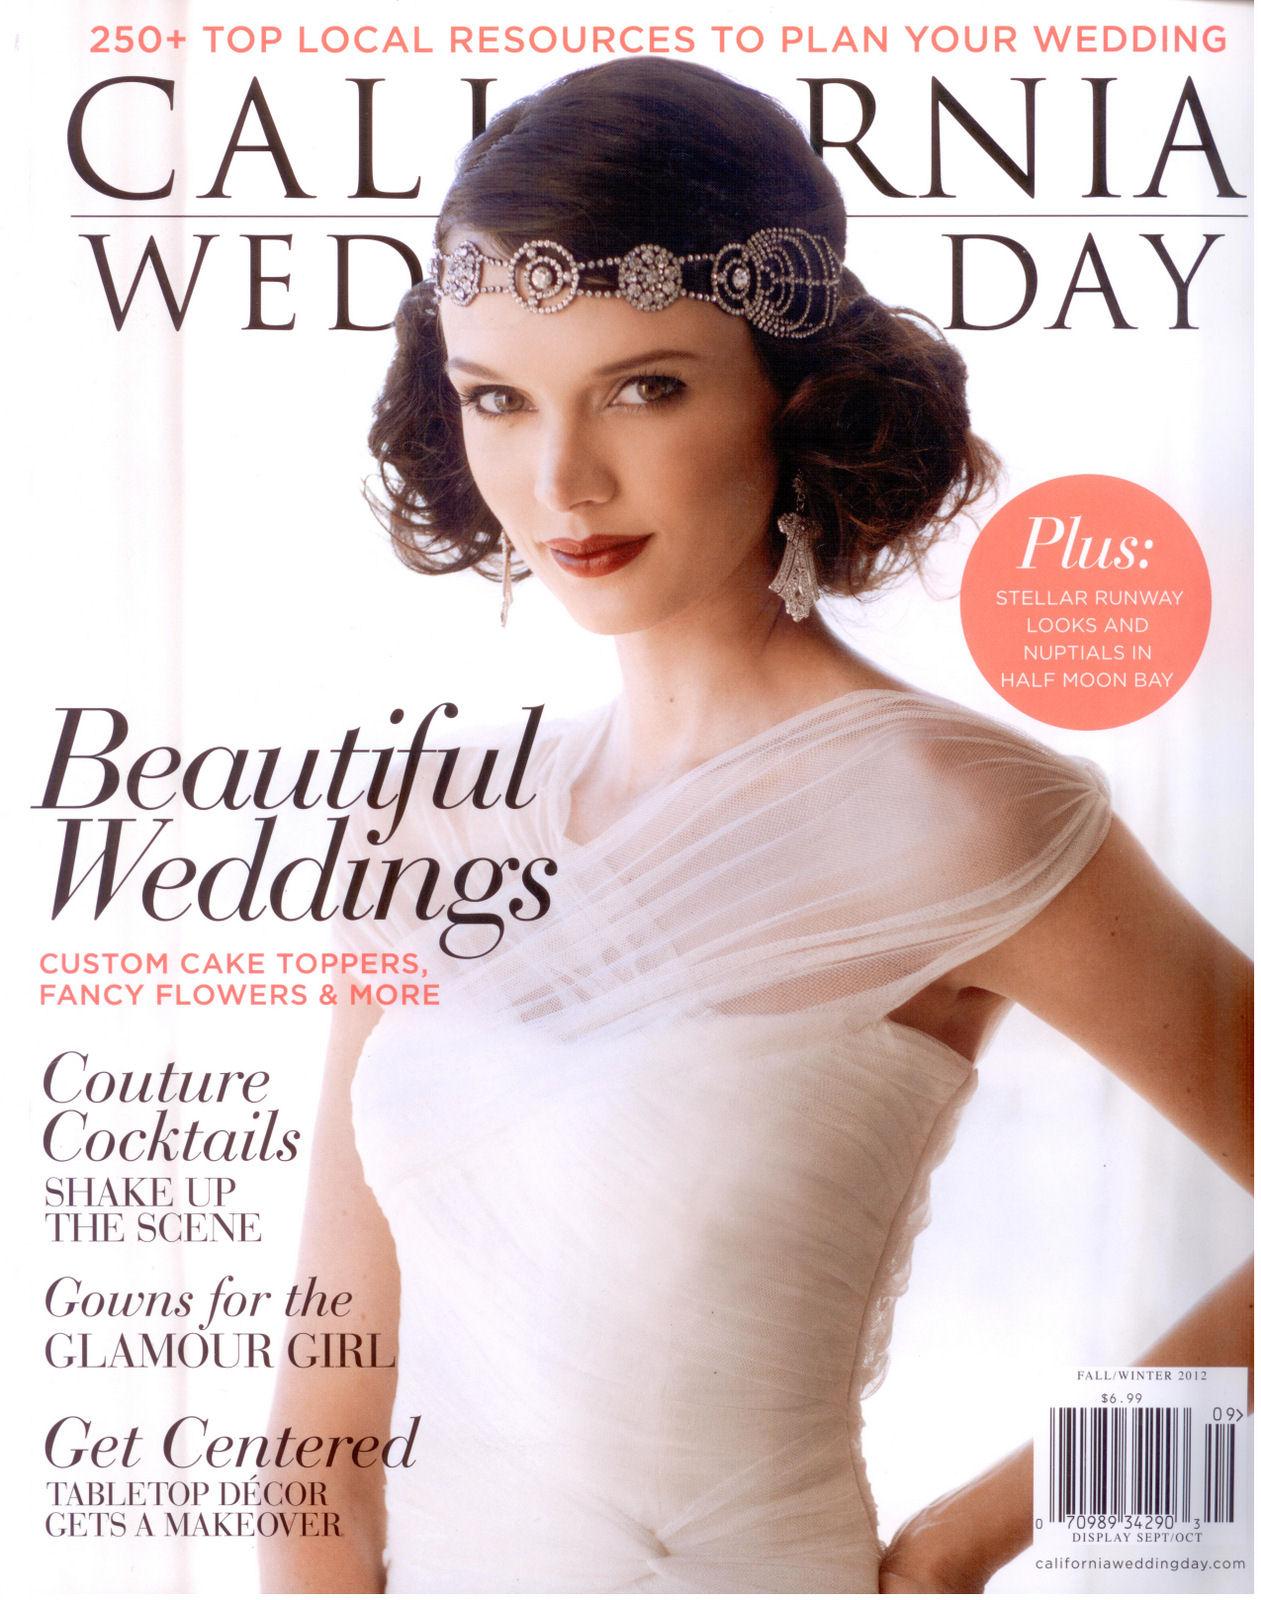 California Wedding Day cover.jpg